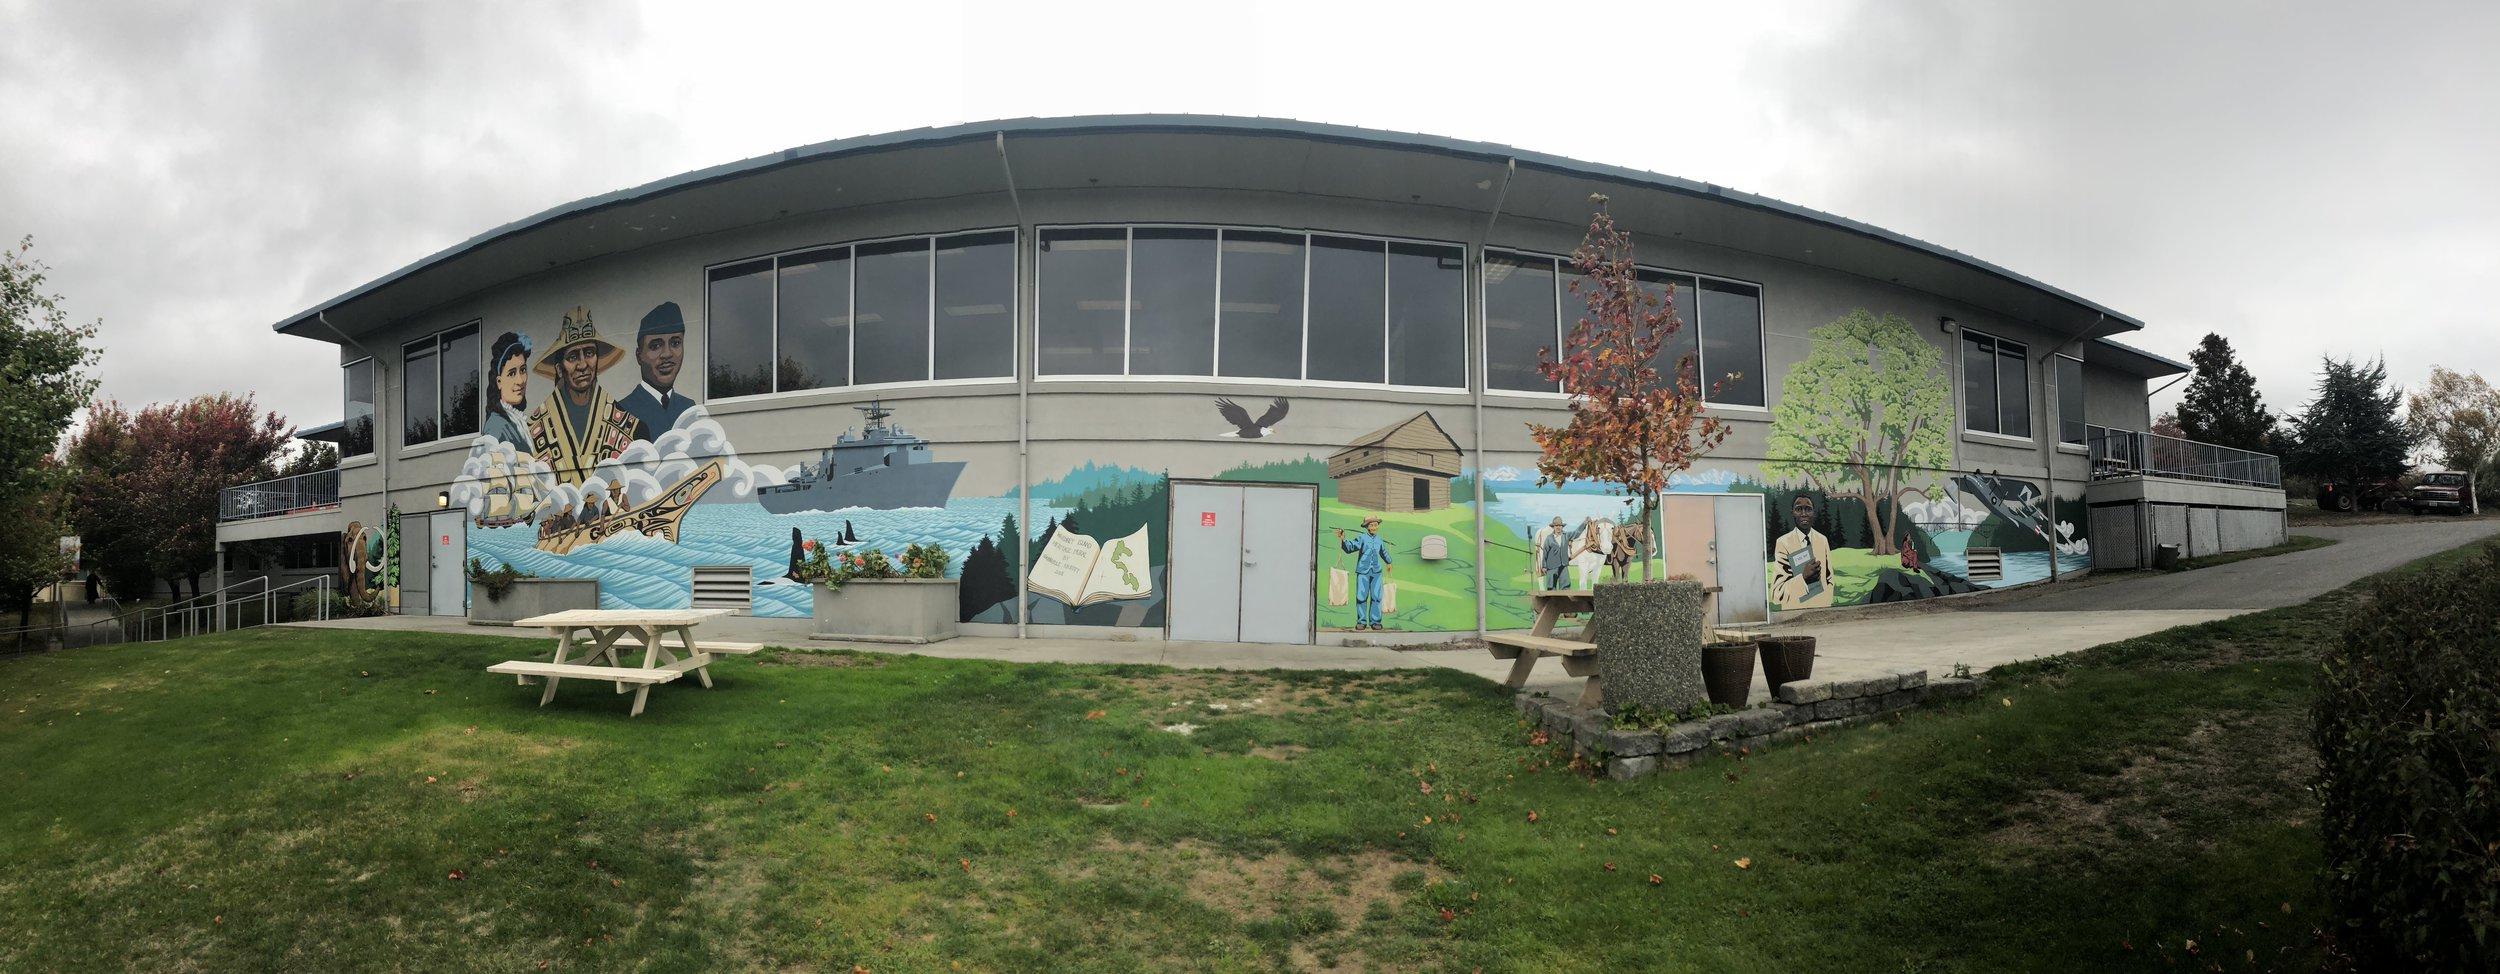 Whidbey Island Mural Panorama.jpg